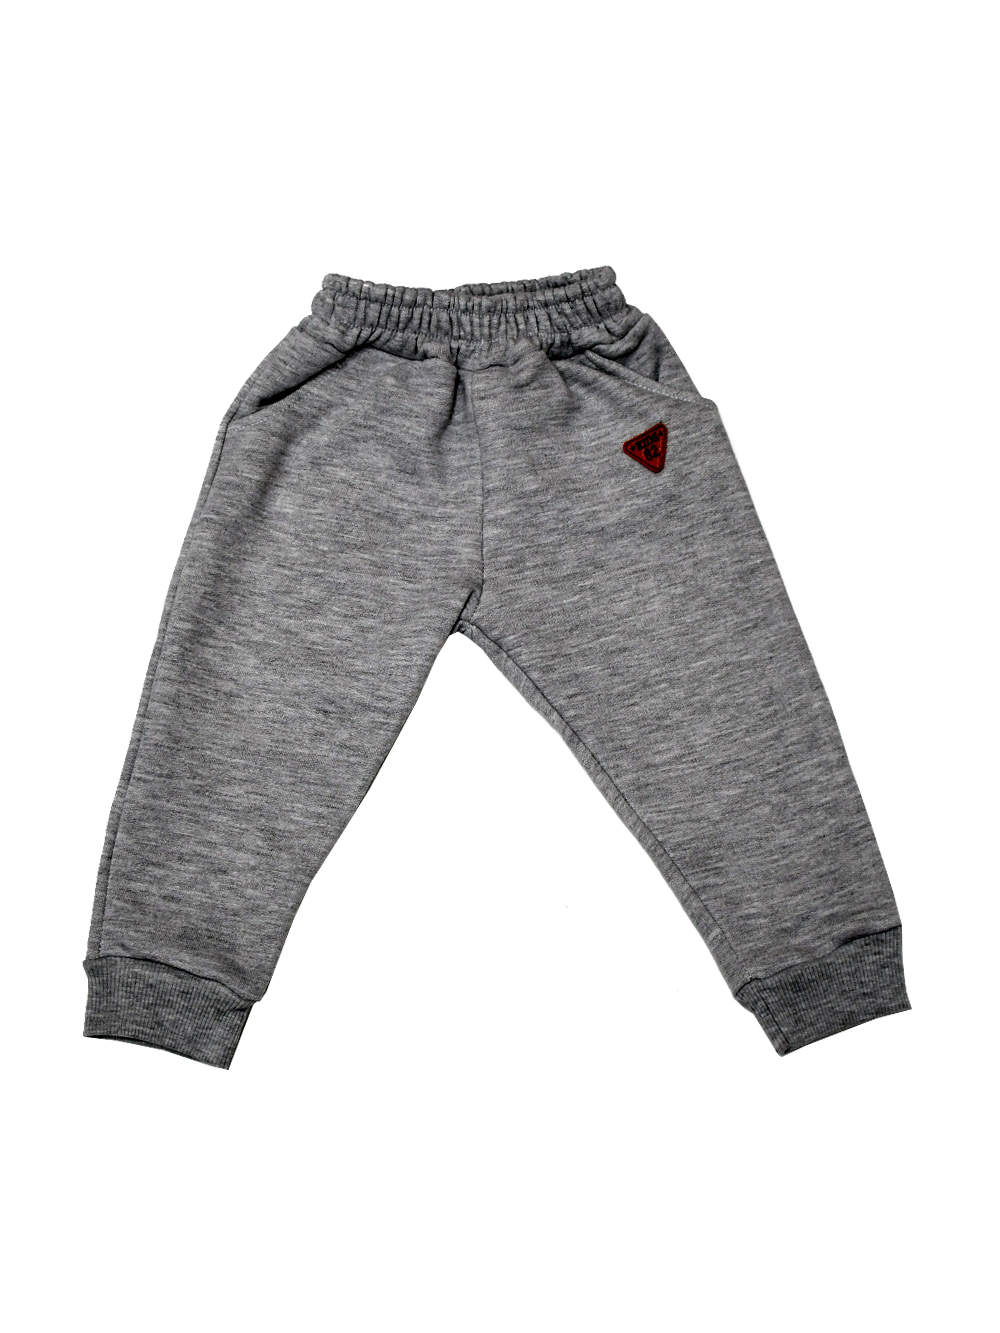 Imagen producto  Pantalon Friza Bebe  4